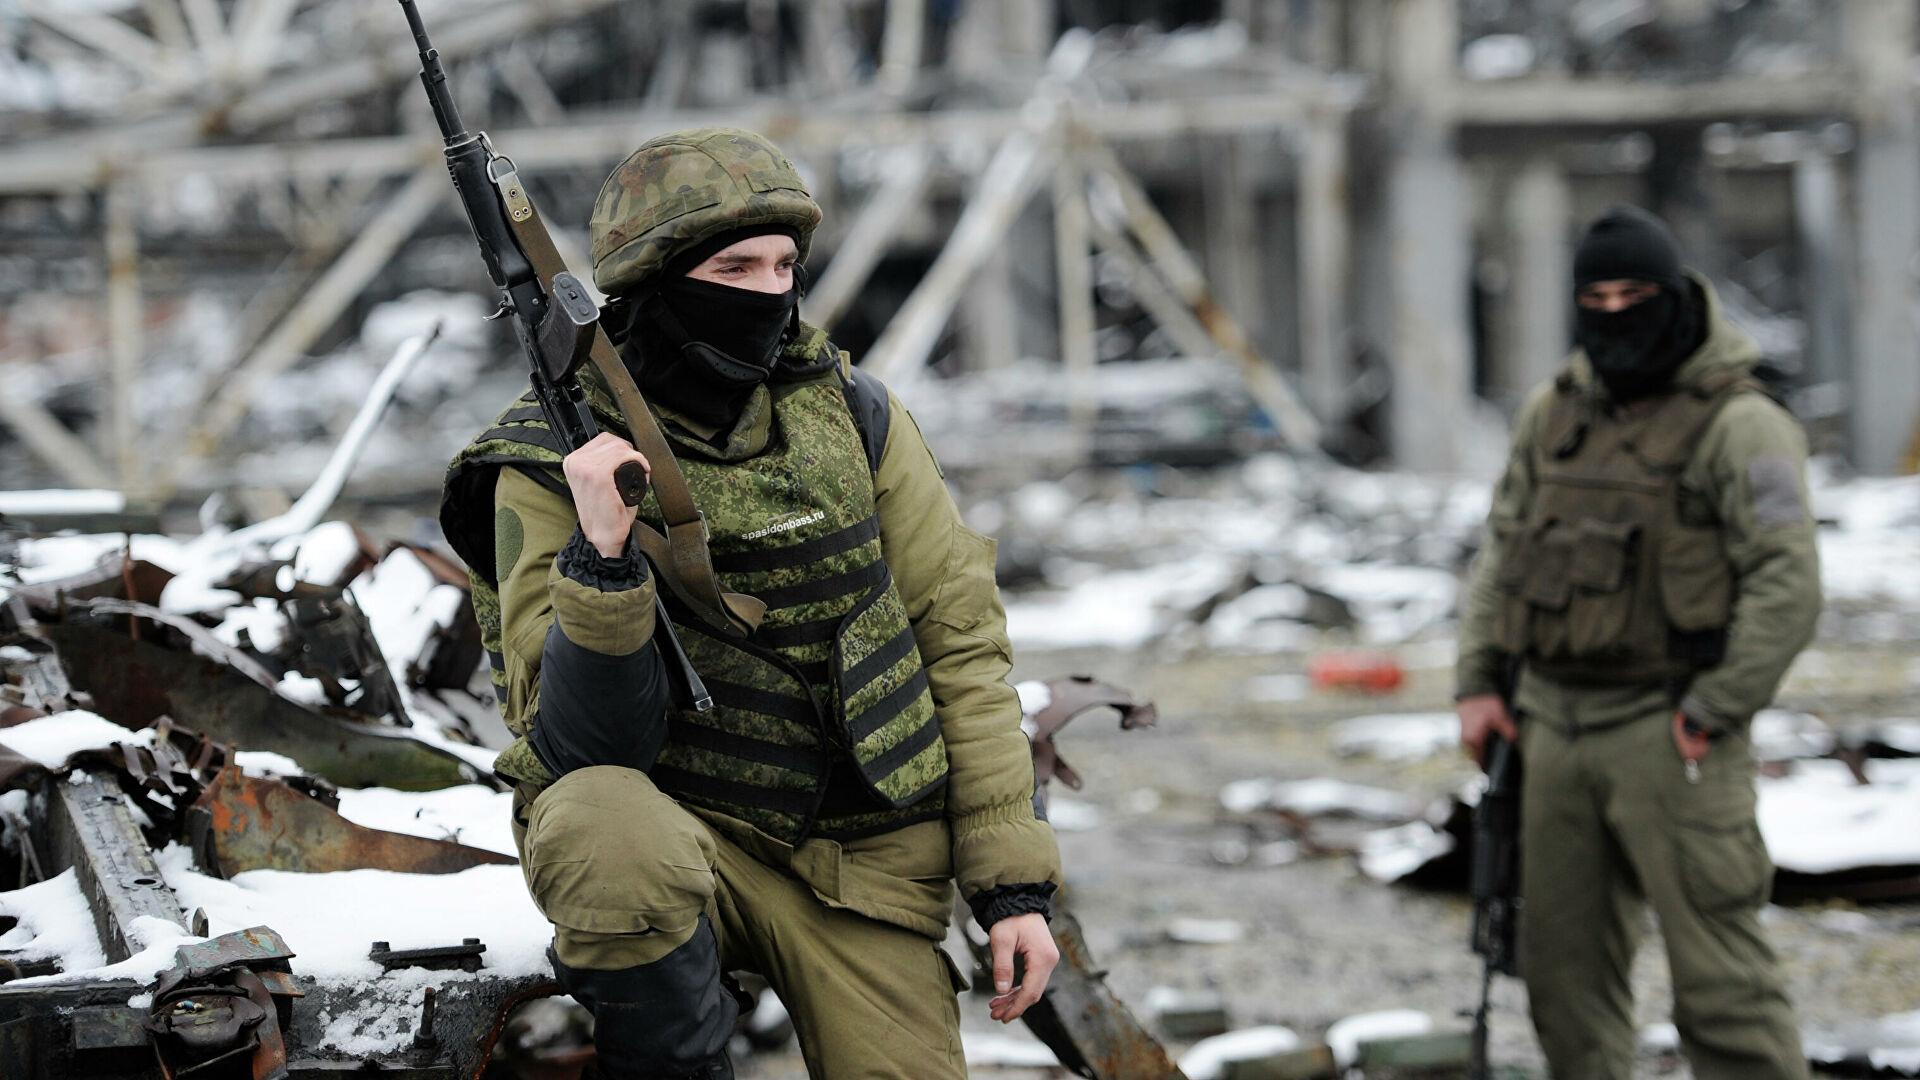 Песков: Агресиван положај украјинских снага у Донбасу изазива забринутост